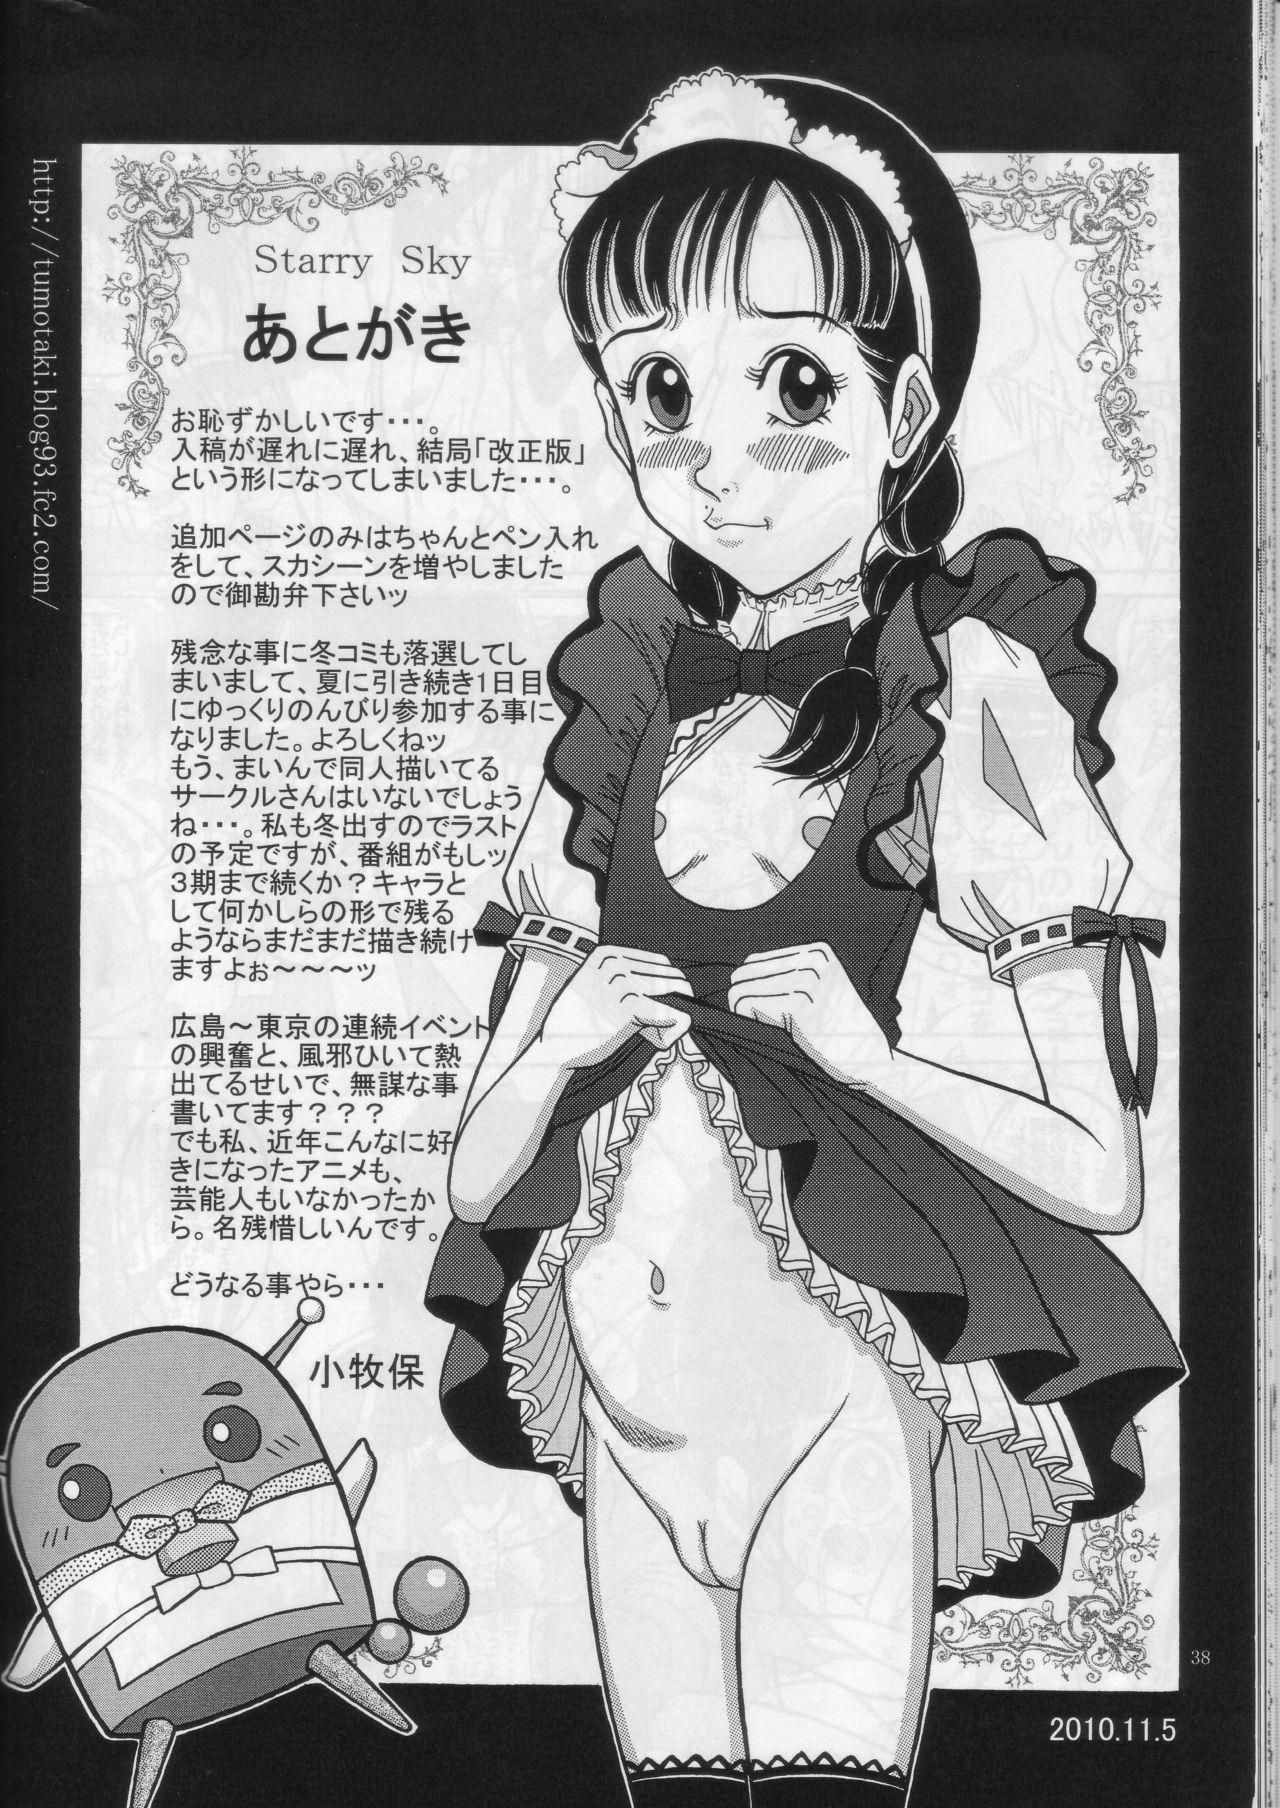 Minna de Yokumite Ara★Domo♪ Kaiseiban 36